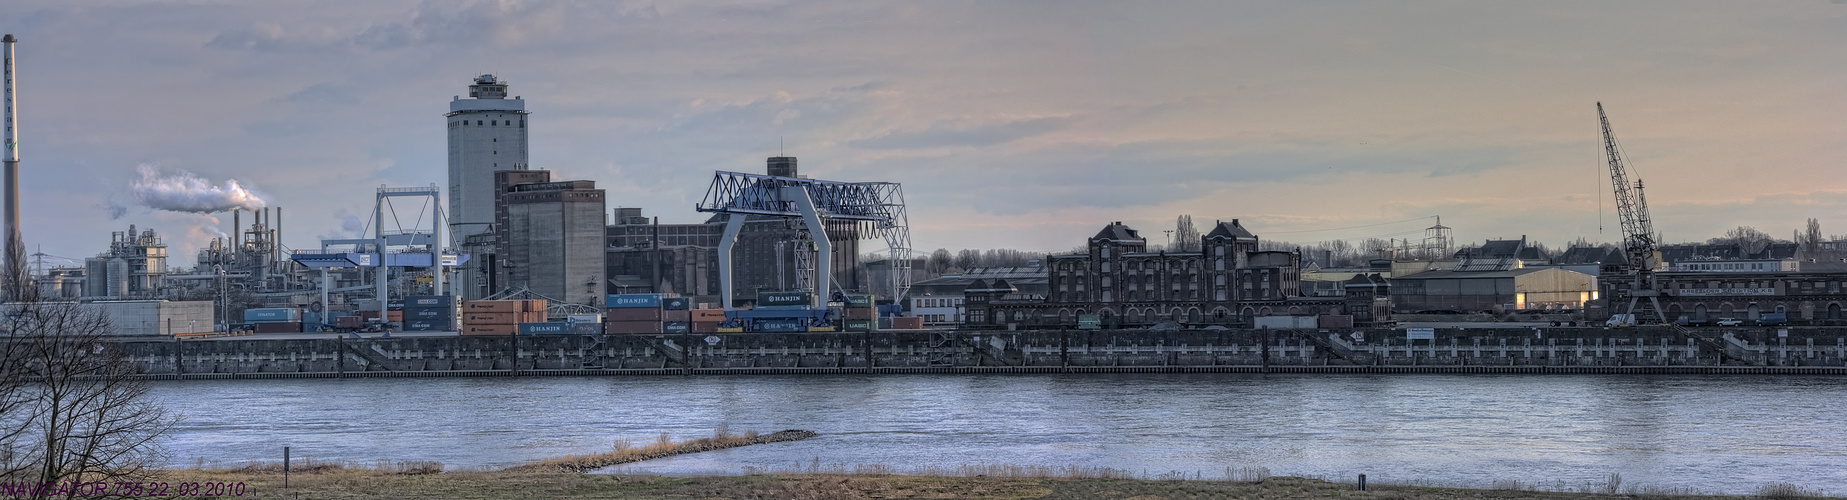 Rheinhafen - Uerdingen III / HDR